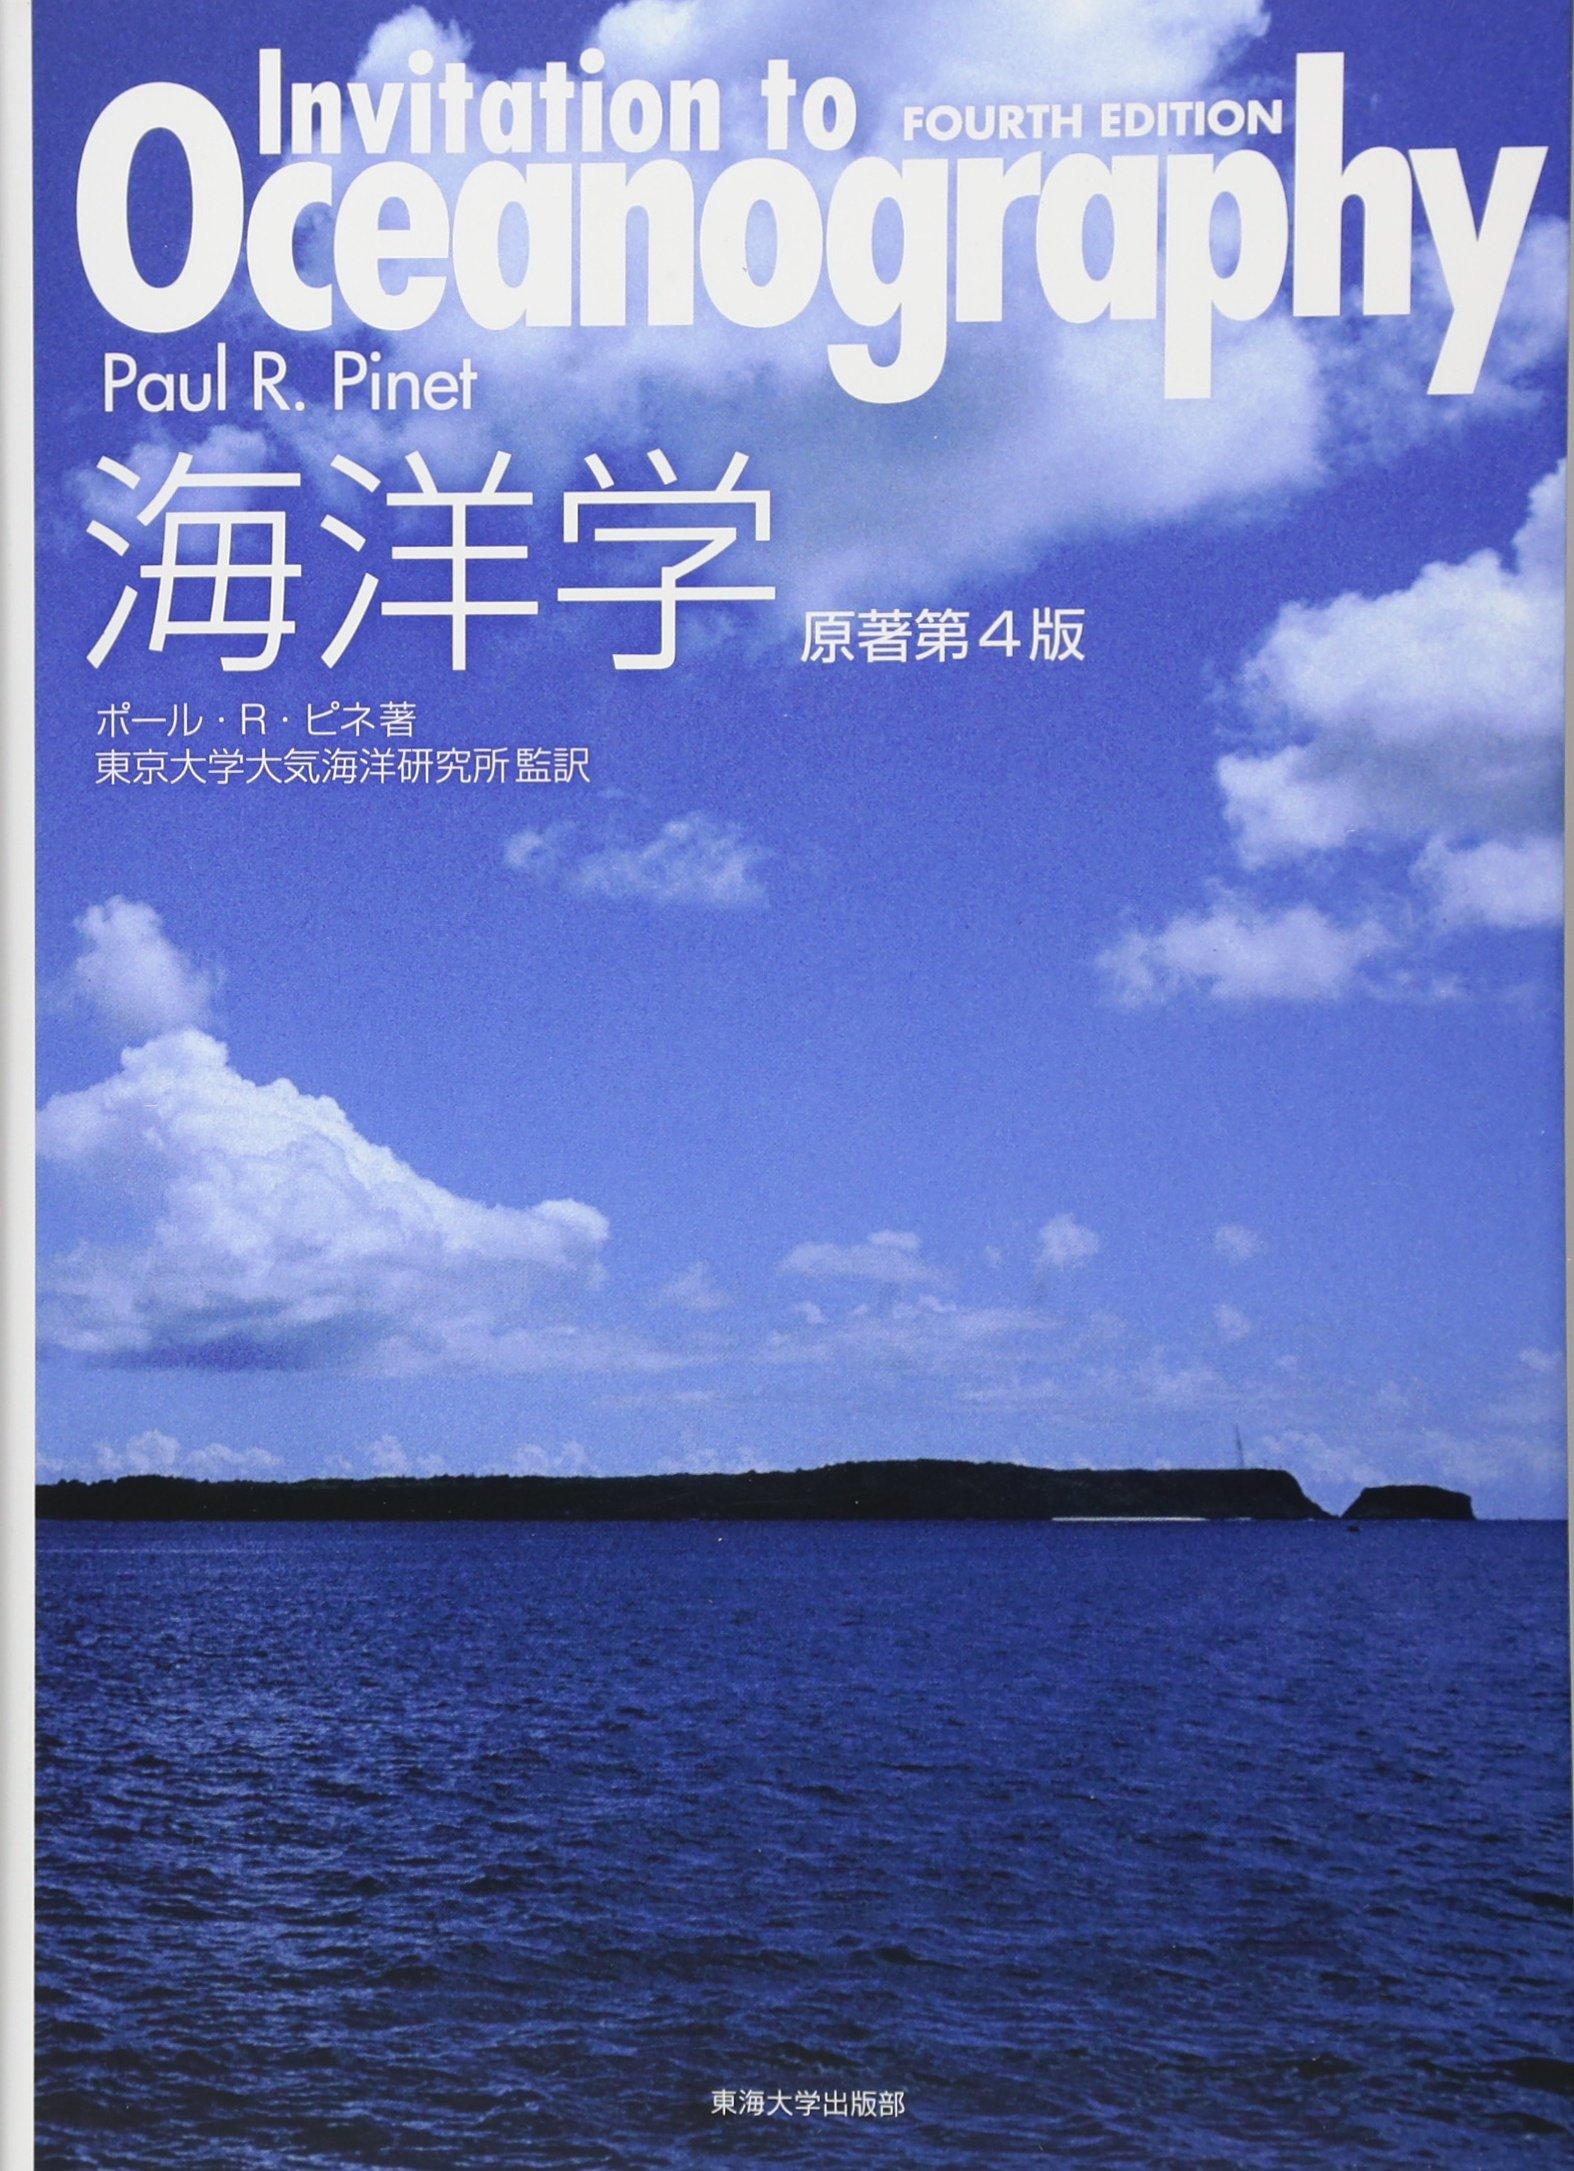 海洋学 | ポール・R. ピネ, Pinet, Paul R., 東京大学海洋研究所, 東大 ...